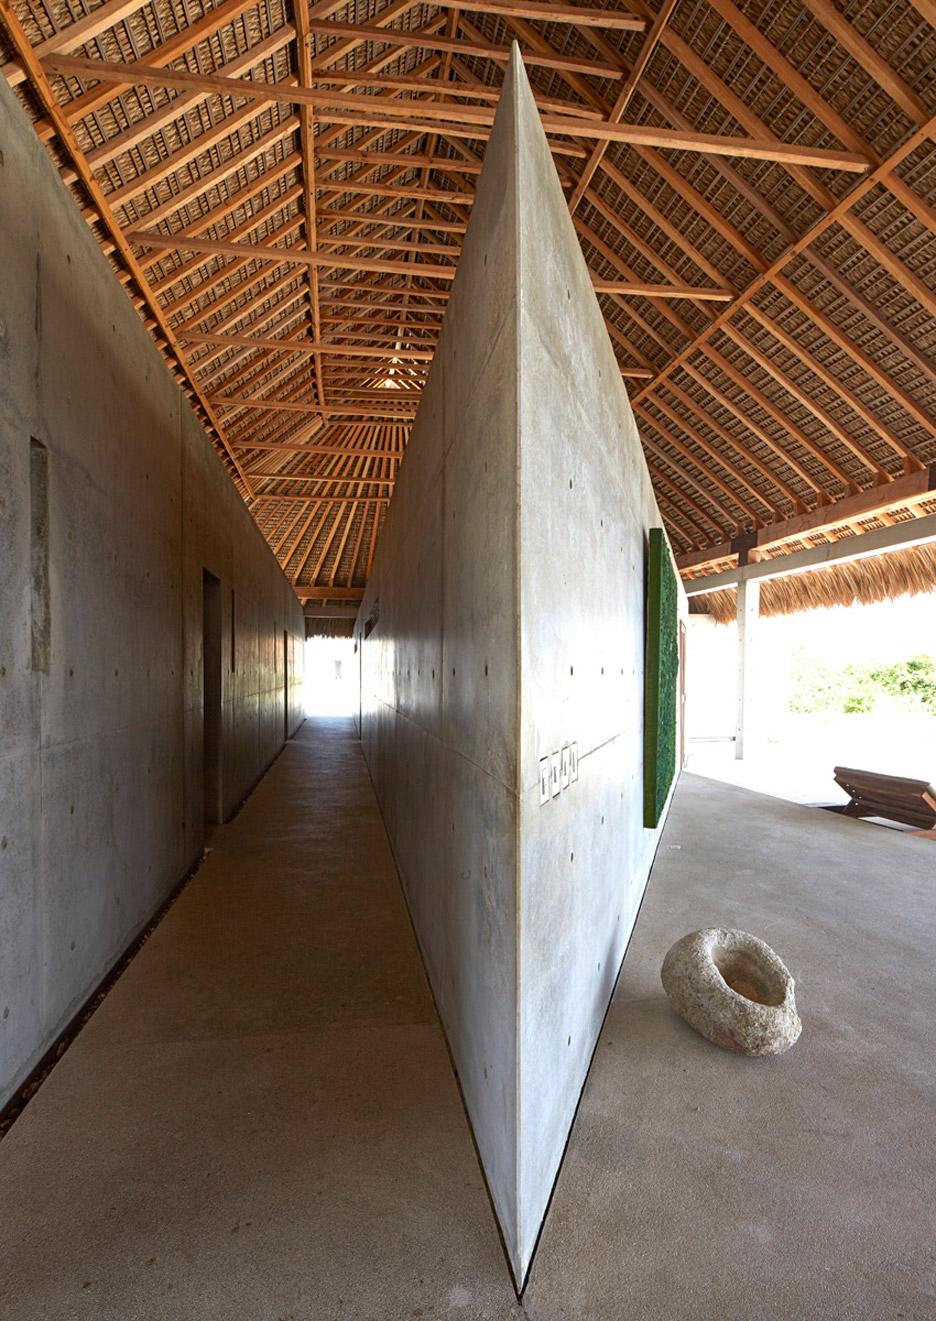 Casa-Wabi_Bosco-Studio-House_Tadao-Ando_Puerto-Escondido_Oaxaca_Mexico_dezeen_936_13.jpg